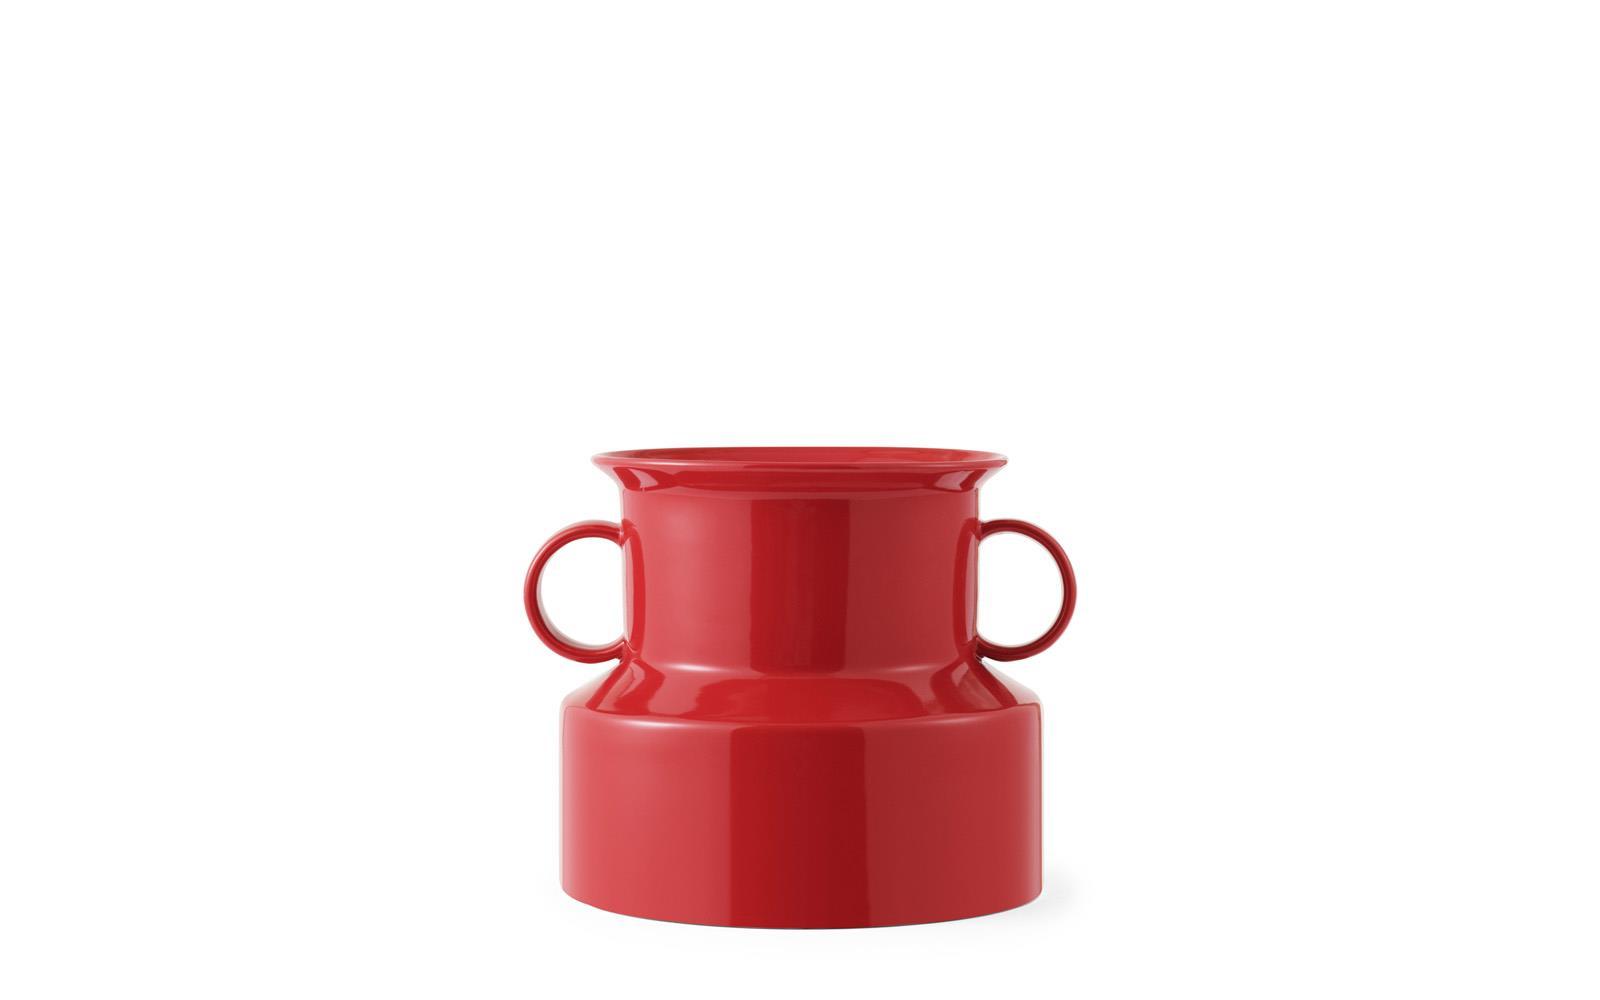 Tivoli Panto Vase Ø 22 x H 19cm Lollipop Red